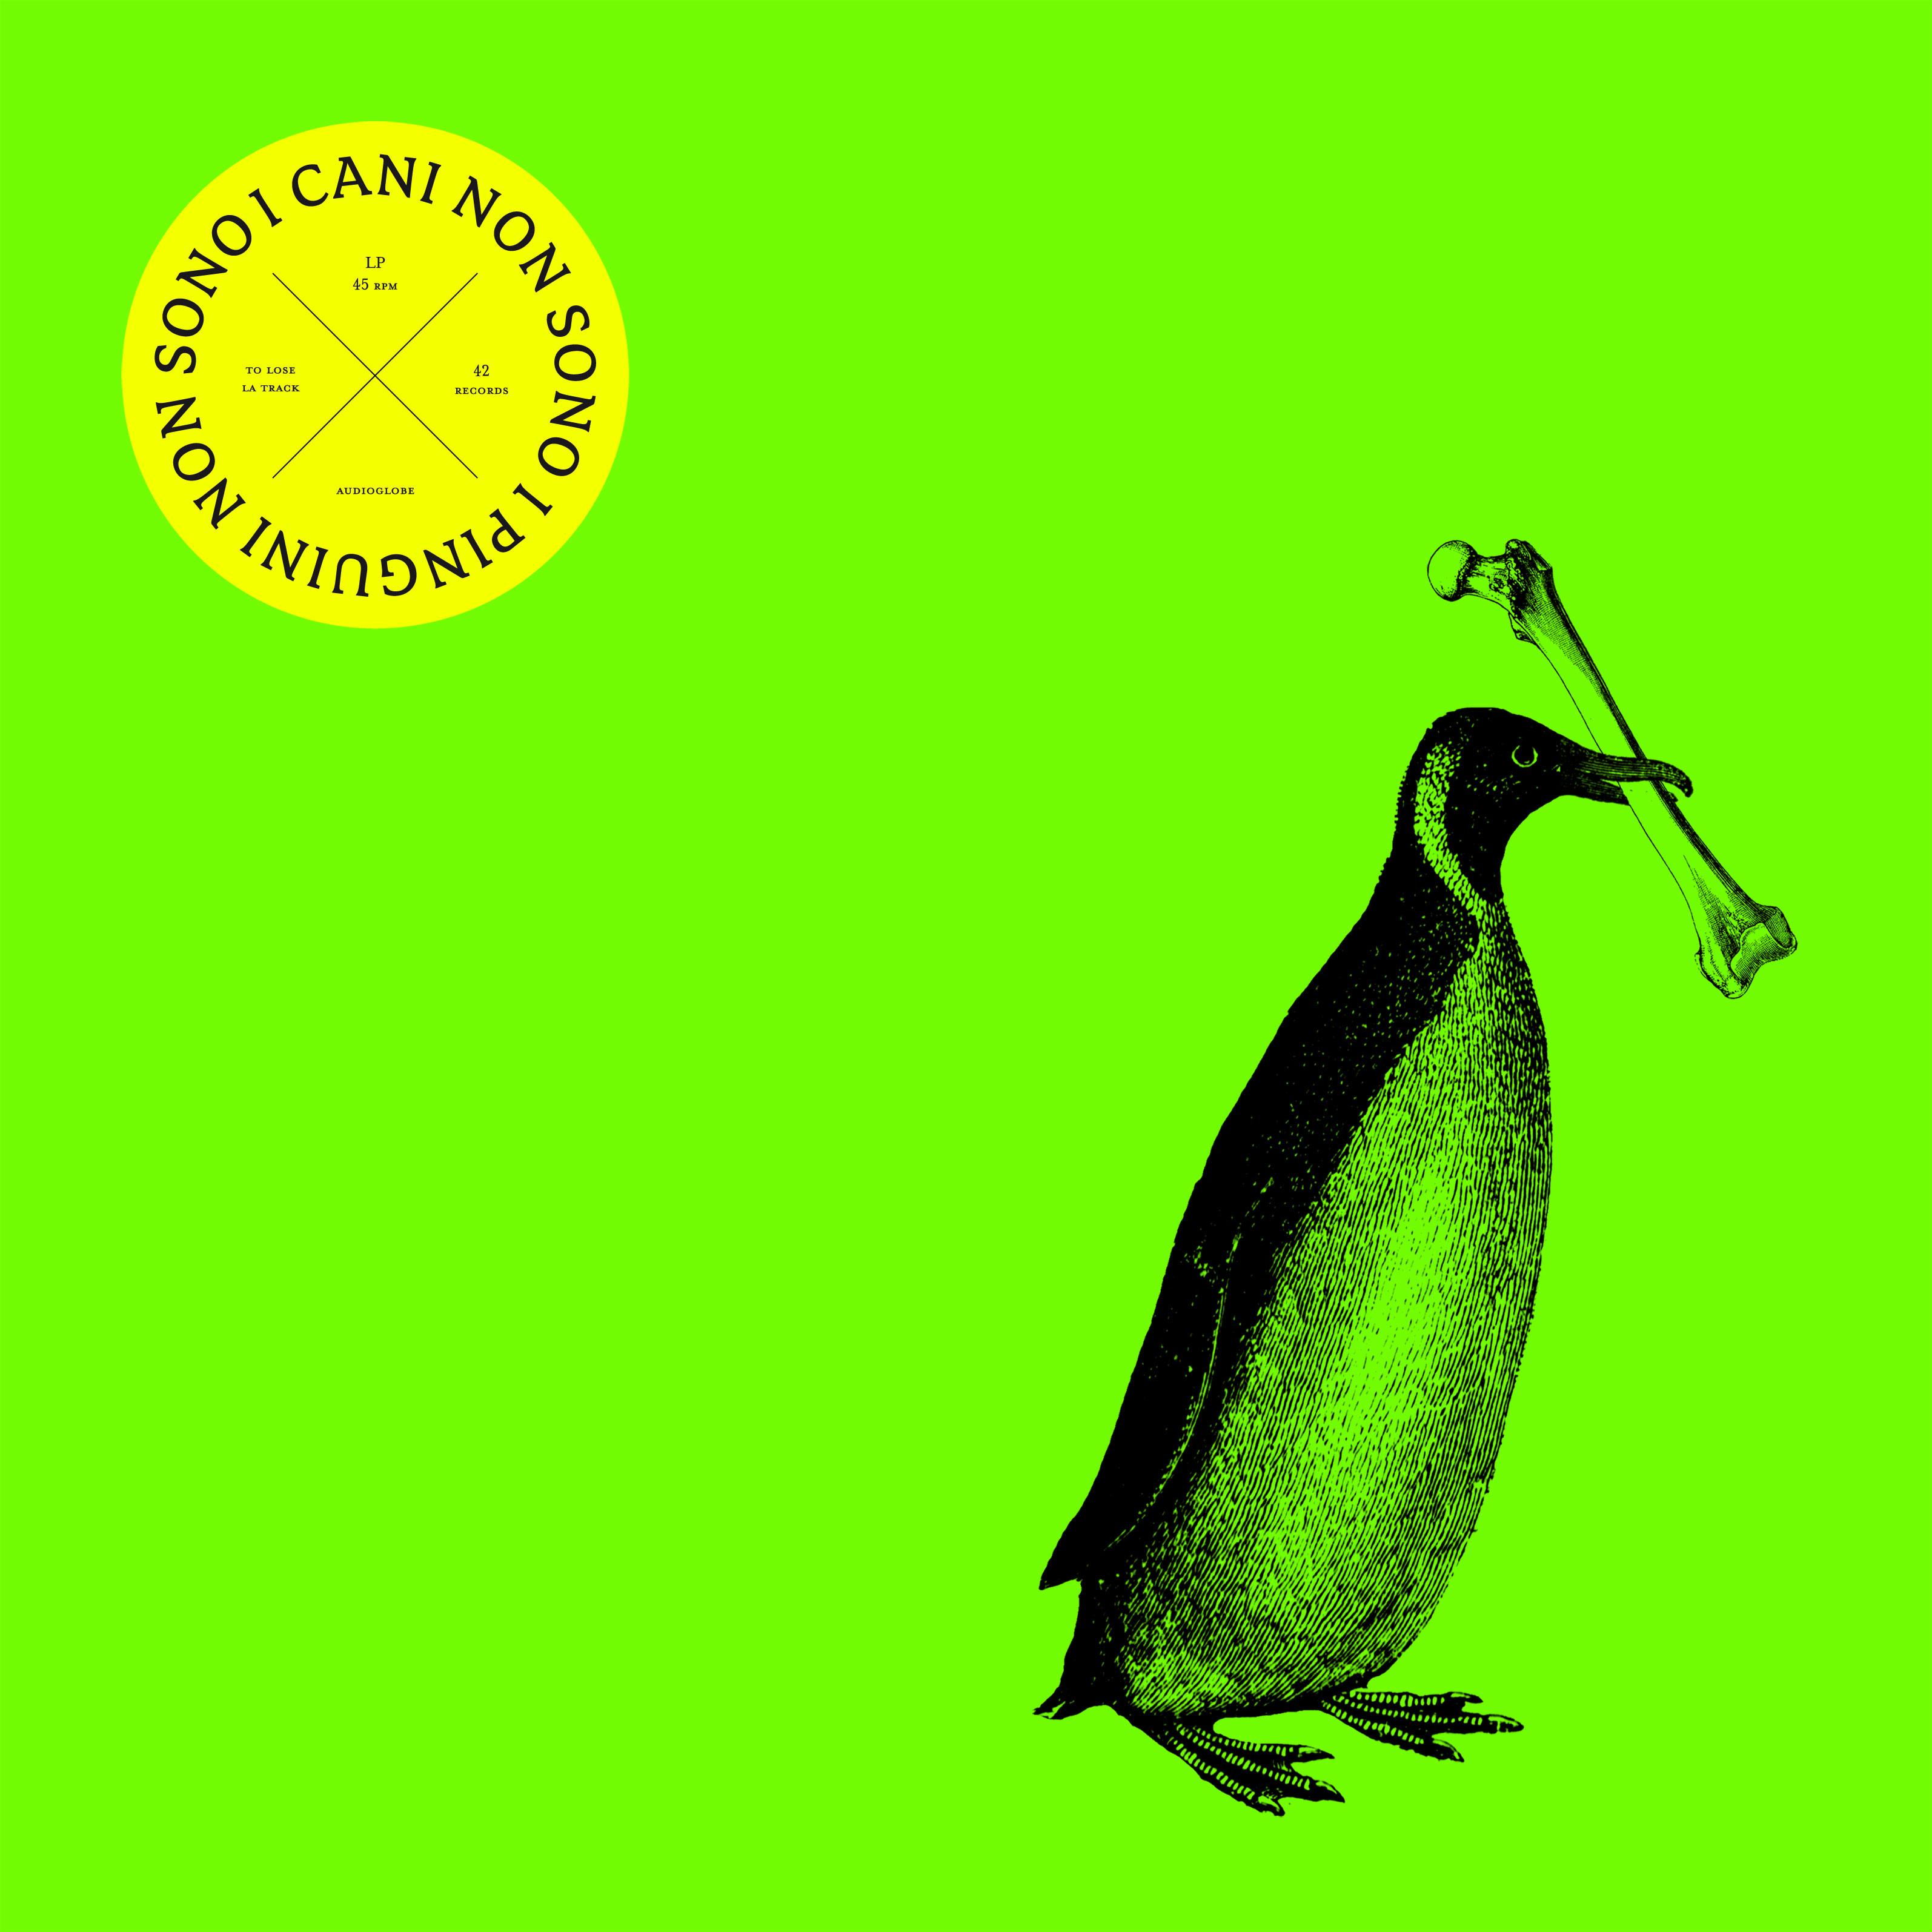 Gazebo Penguins / I Cani - I cani non sono i pinguini, i pinguini non sono i cani split 10''